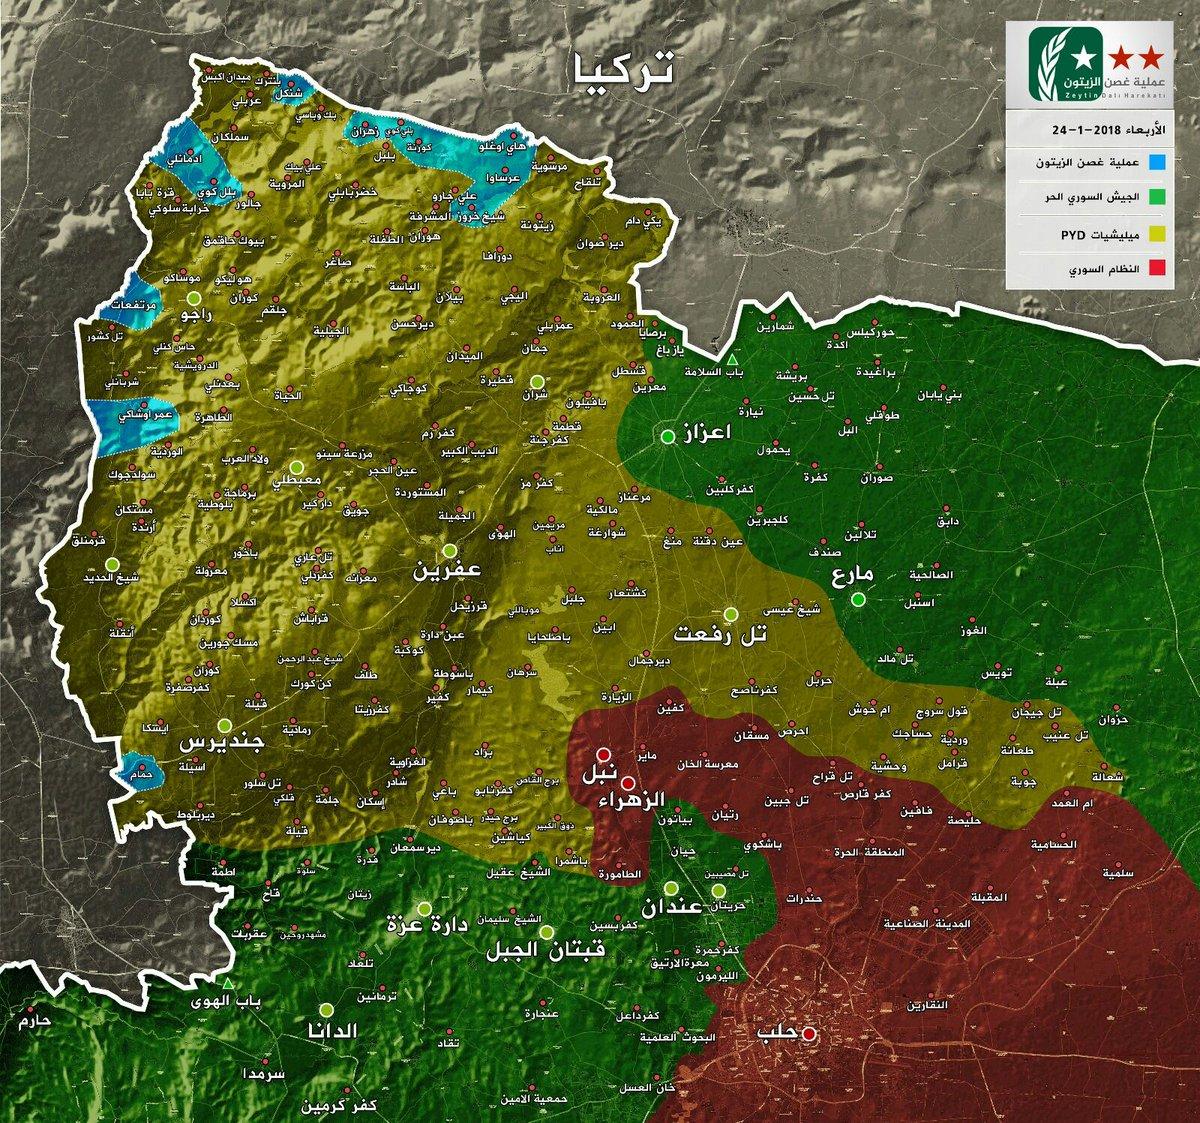 Operation Olive Branch map YALLA SOURIYA